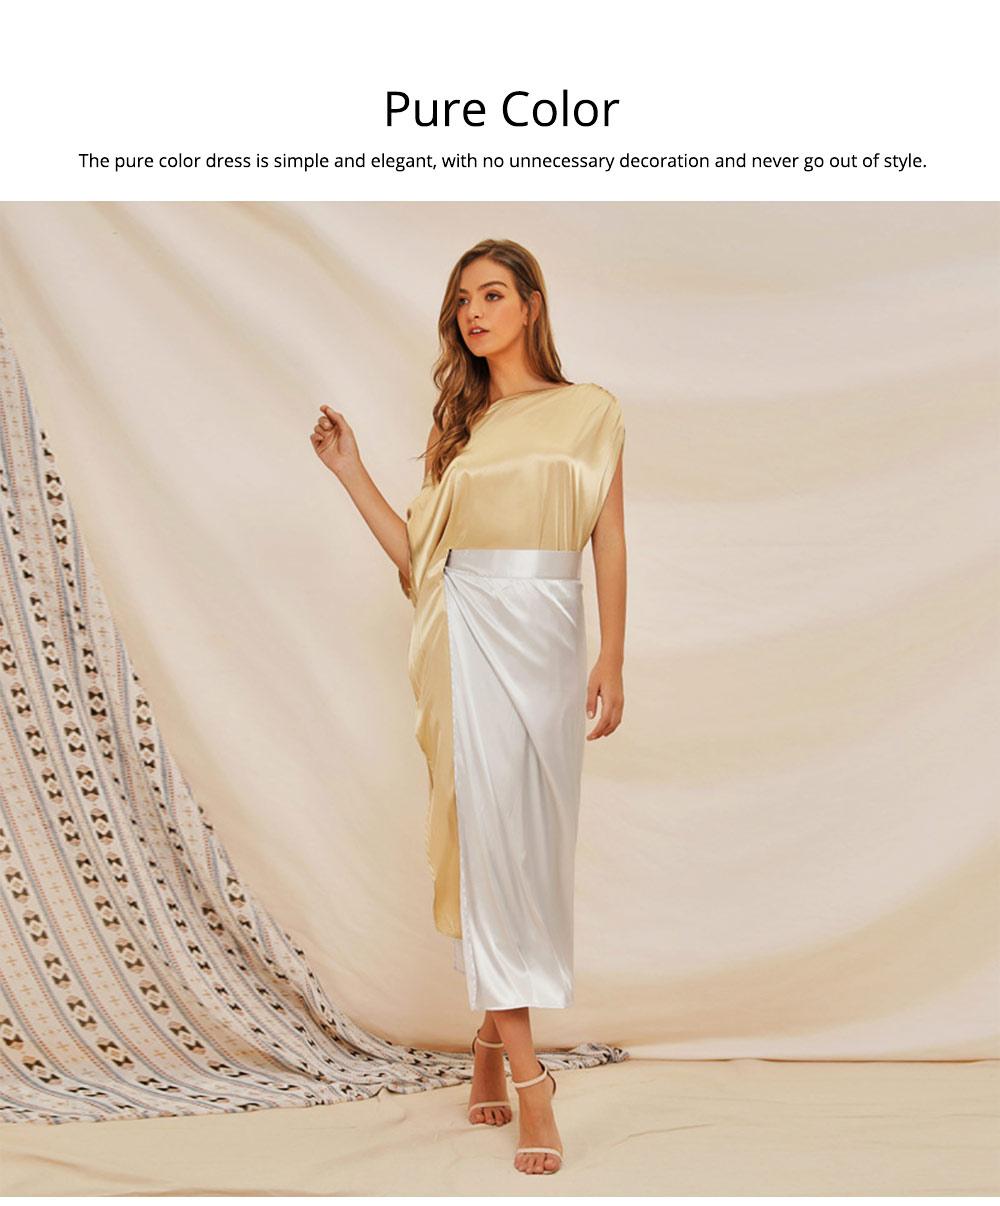 Sloping Shoulder Women Dress, Sexy Fashion Champagne Irregular Casual Dress, High Slit Short Sleeve Elegant Dress 2019 New 4